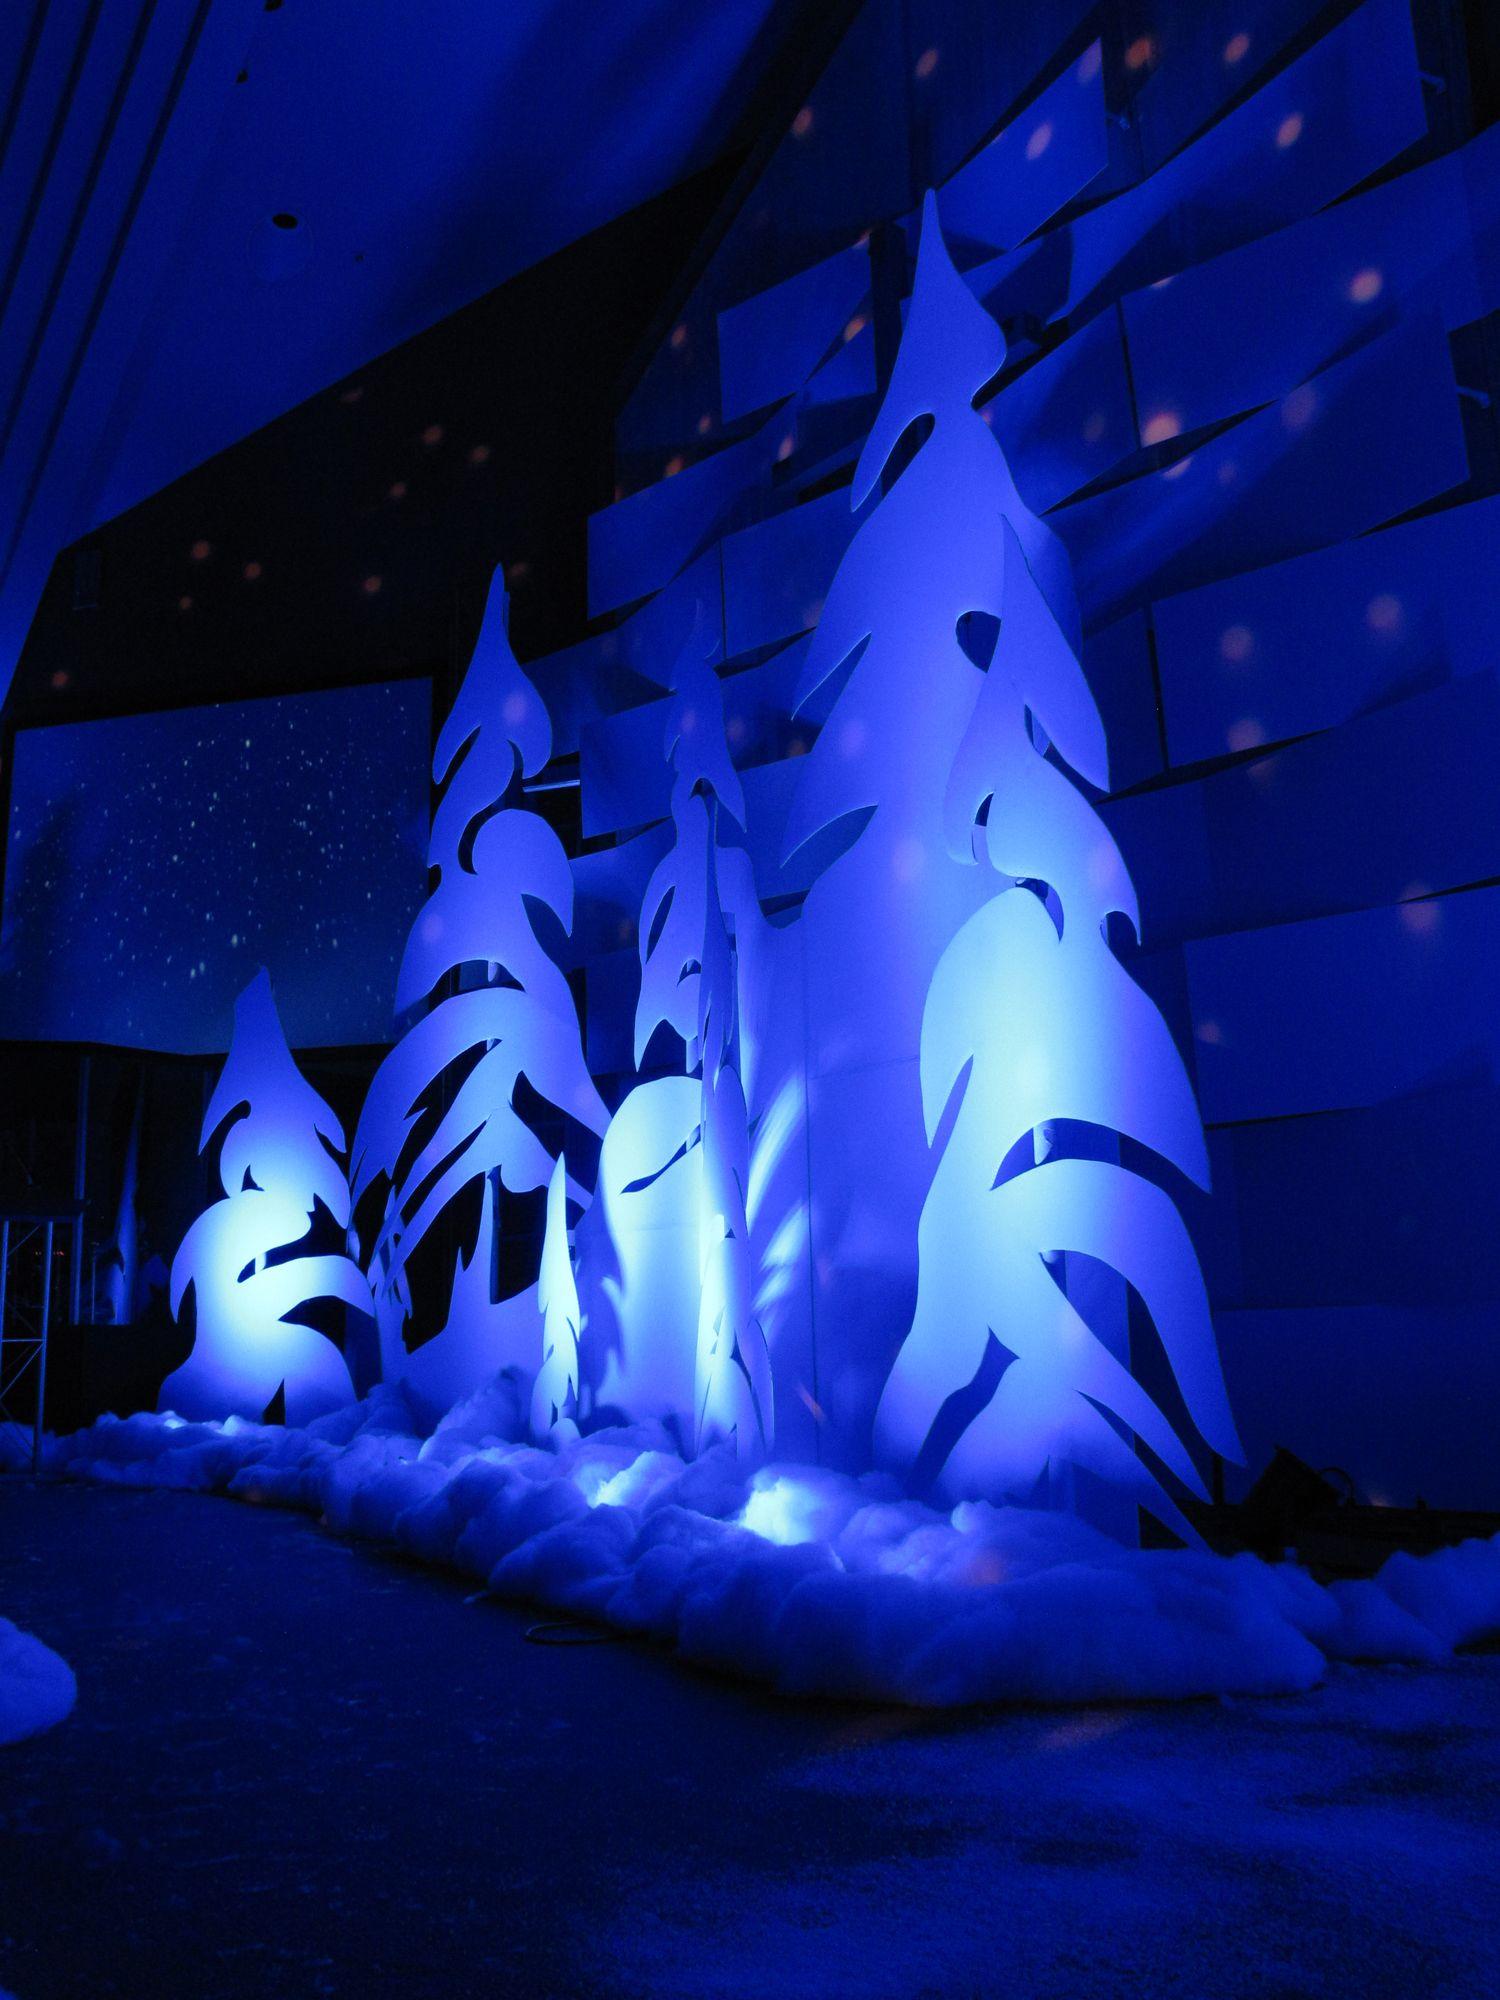 Christmas festival ideas for church - Whoville Christmas Tree Whoville Trees Church Stage Design Ideas